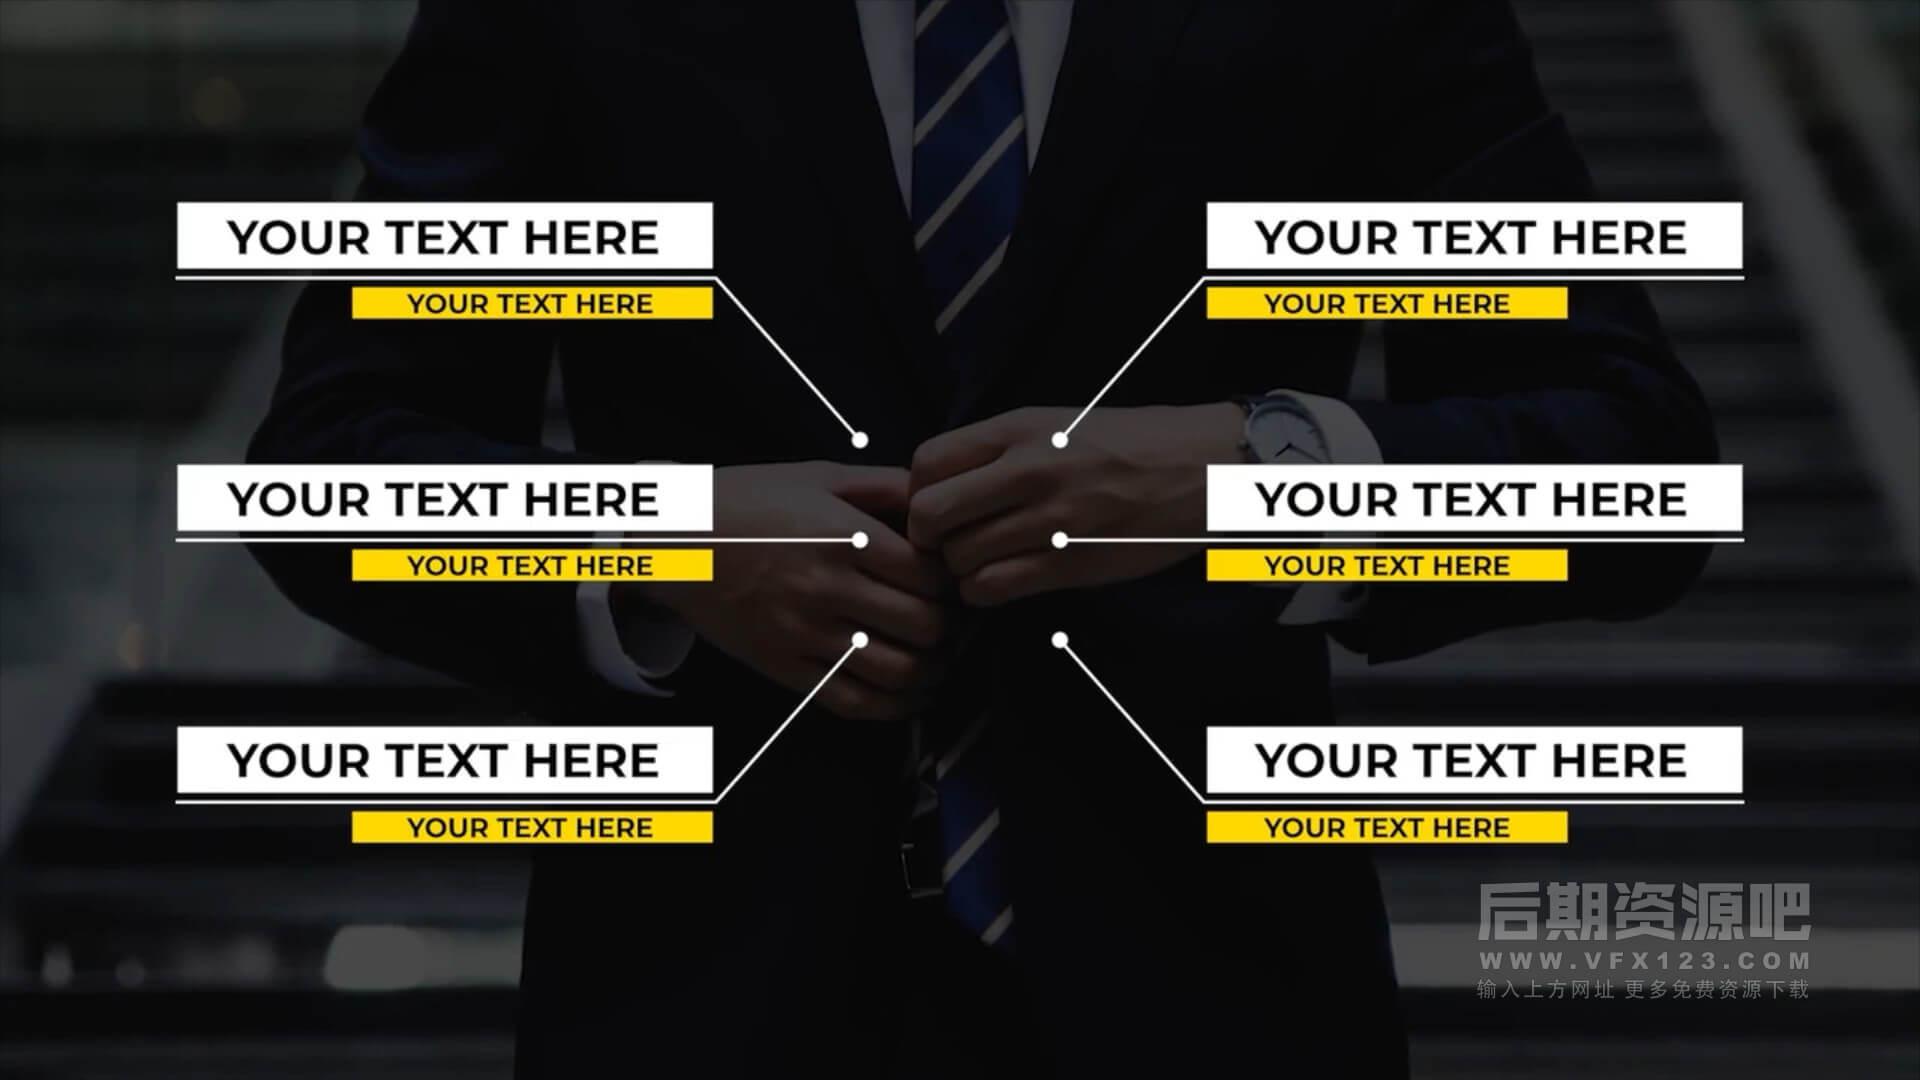 fcpx插件 常用文字标题动画包 字幕条标注文本动画等 Animated Text Bundle